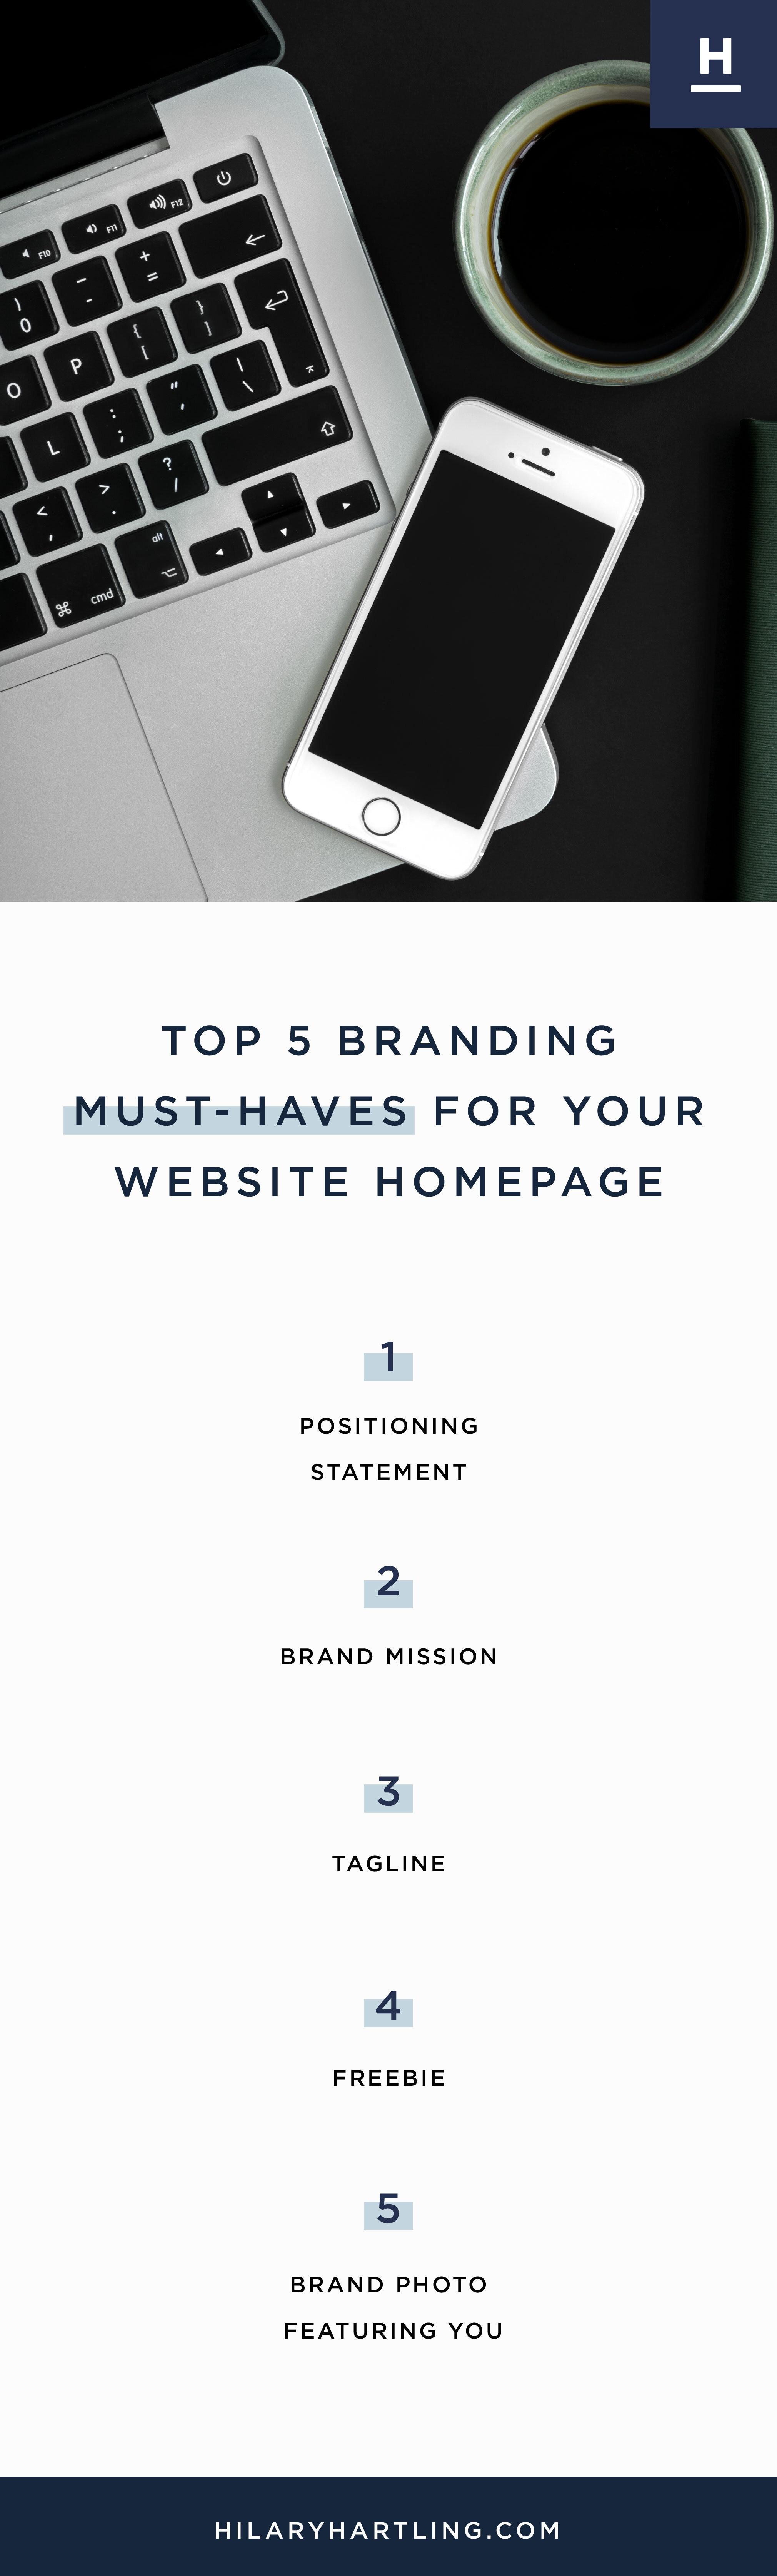 Top-5-Branding-Must-Haves-For-Your-Website-Homepage2.jpg